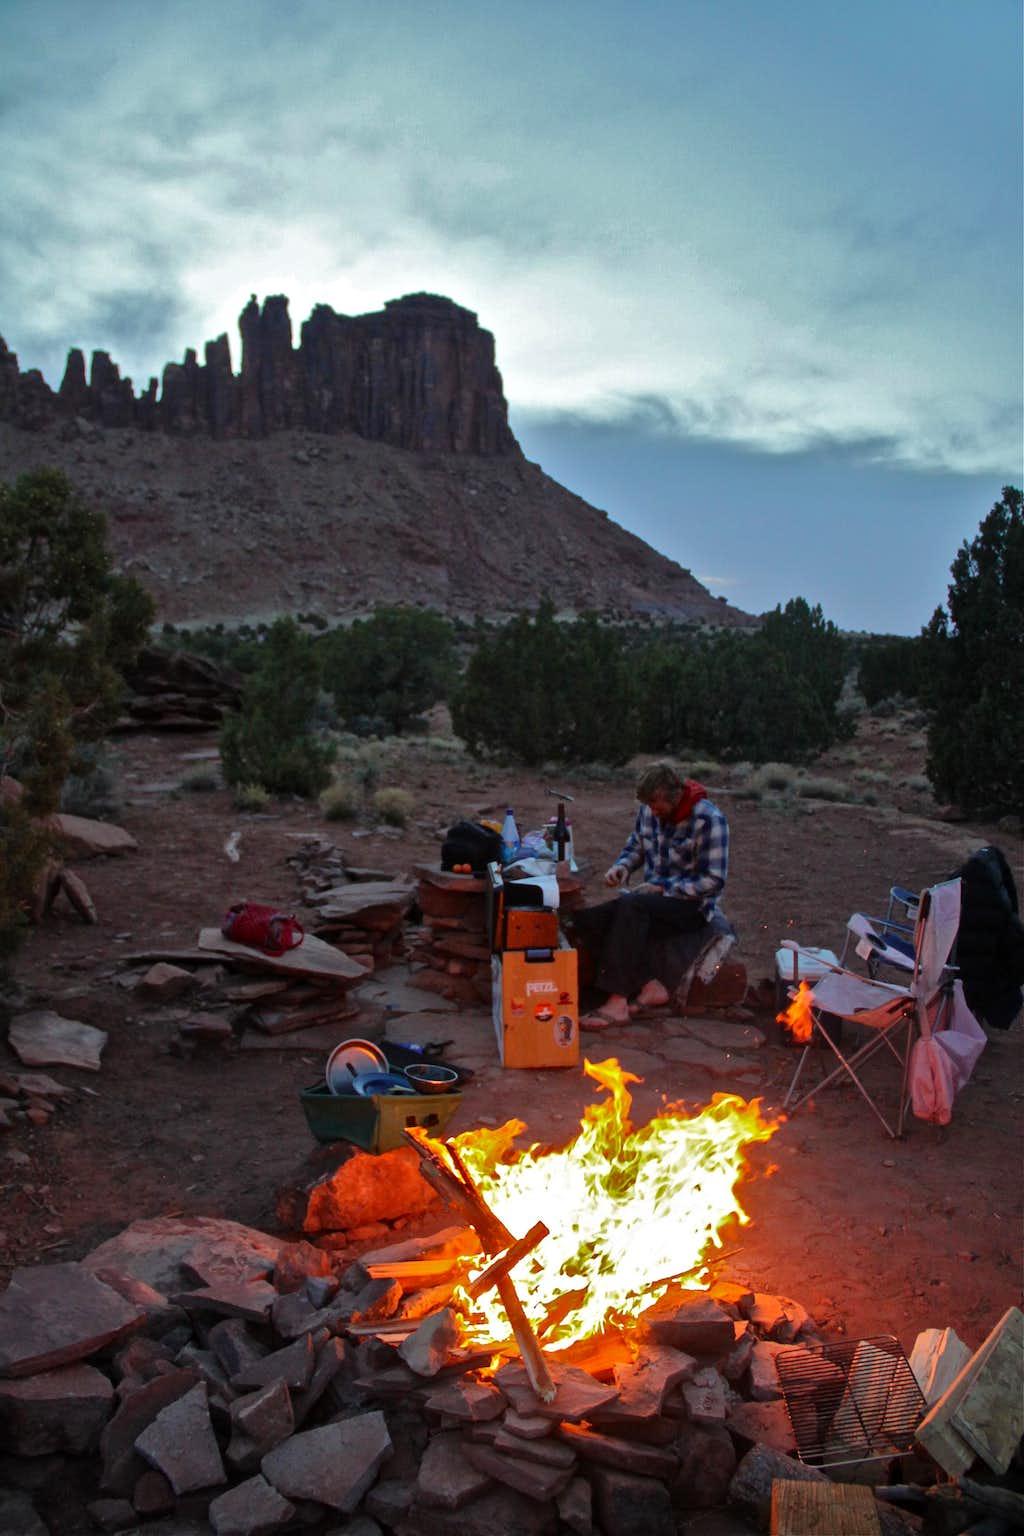 Camping at Bridger jacks